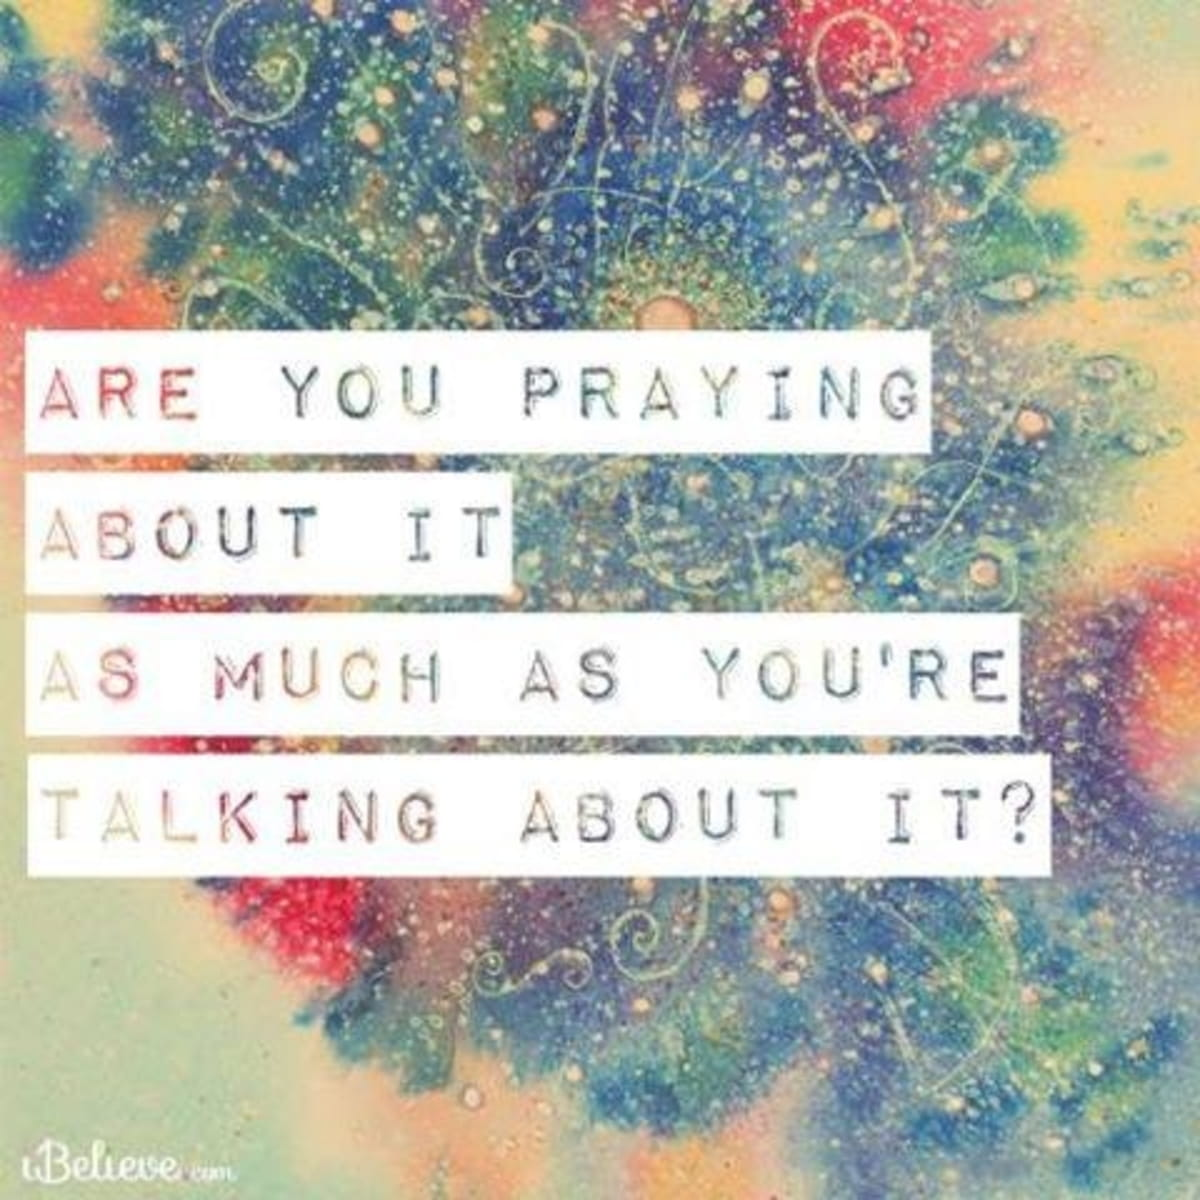 Praying about It, or Just Talking?